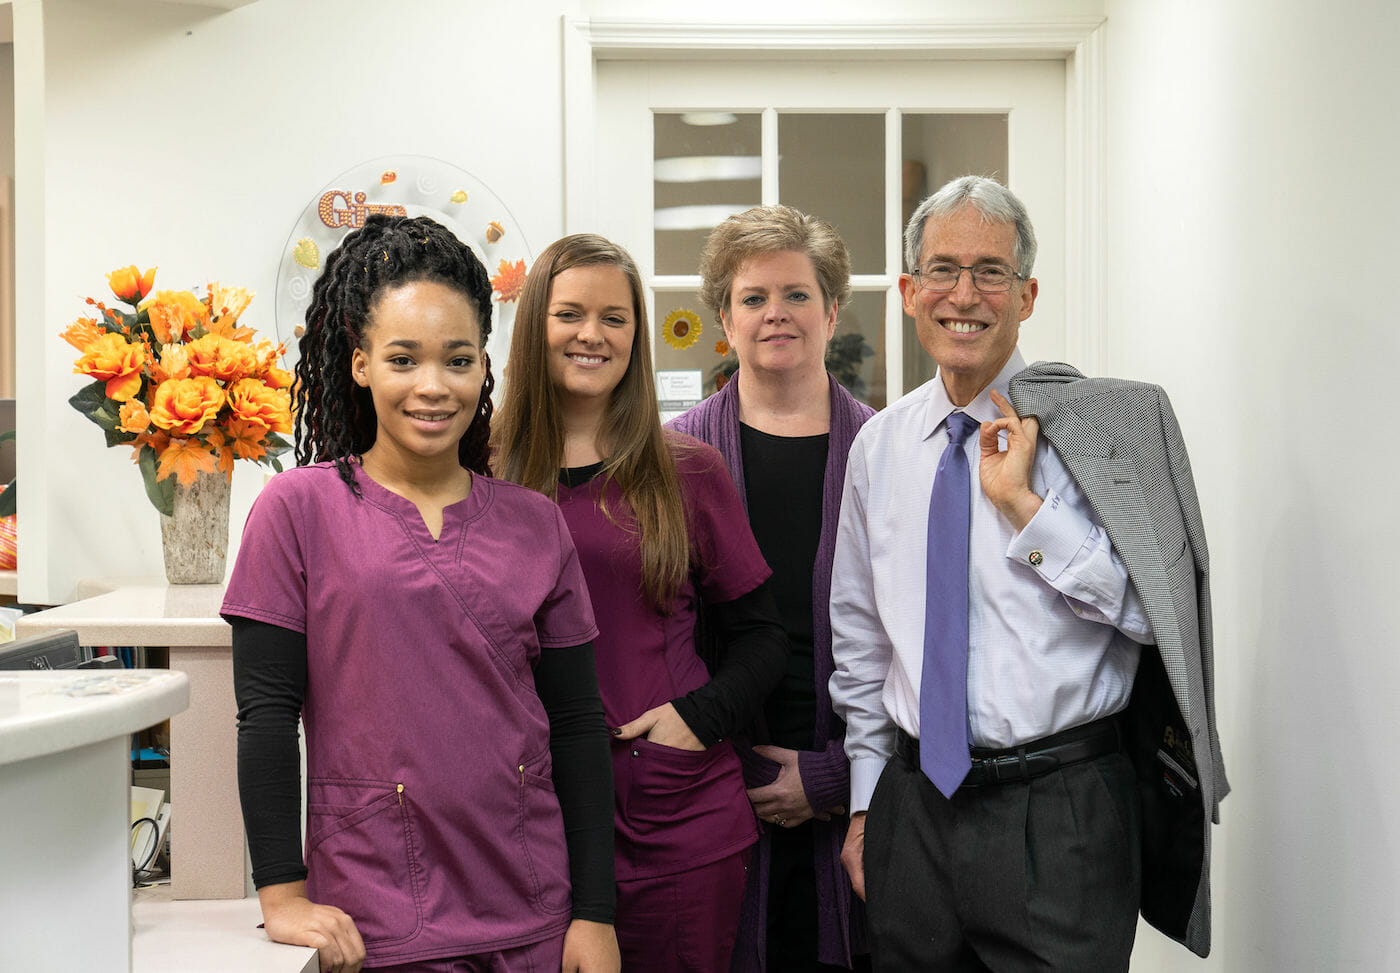 Dr. Hollander & Team